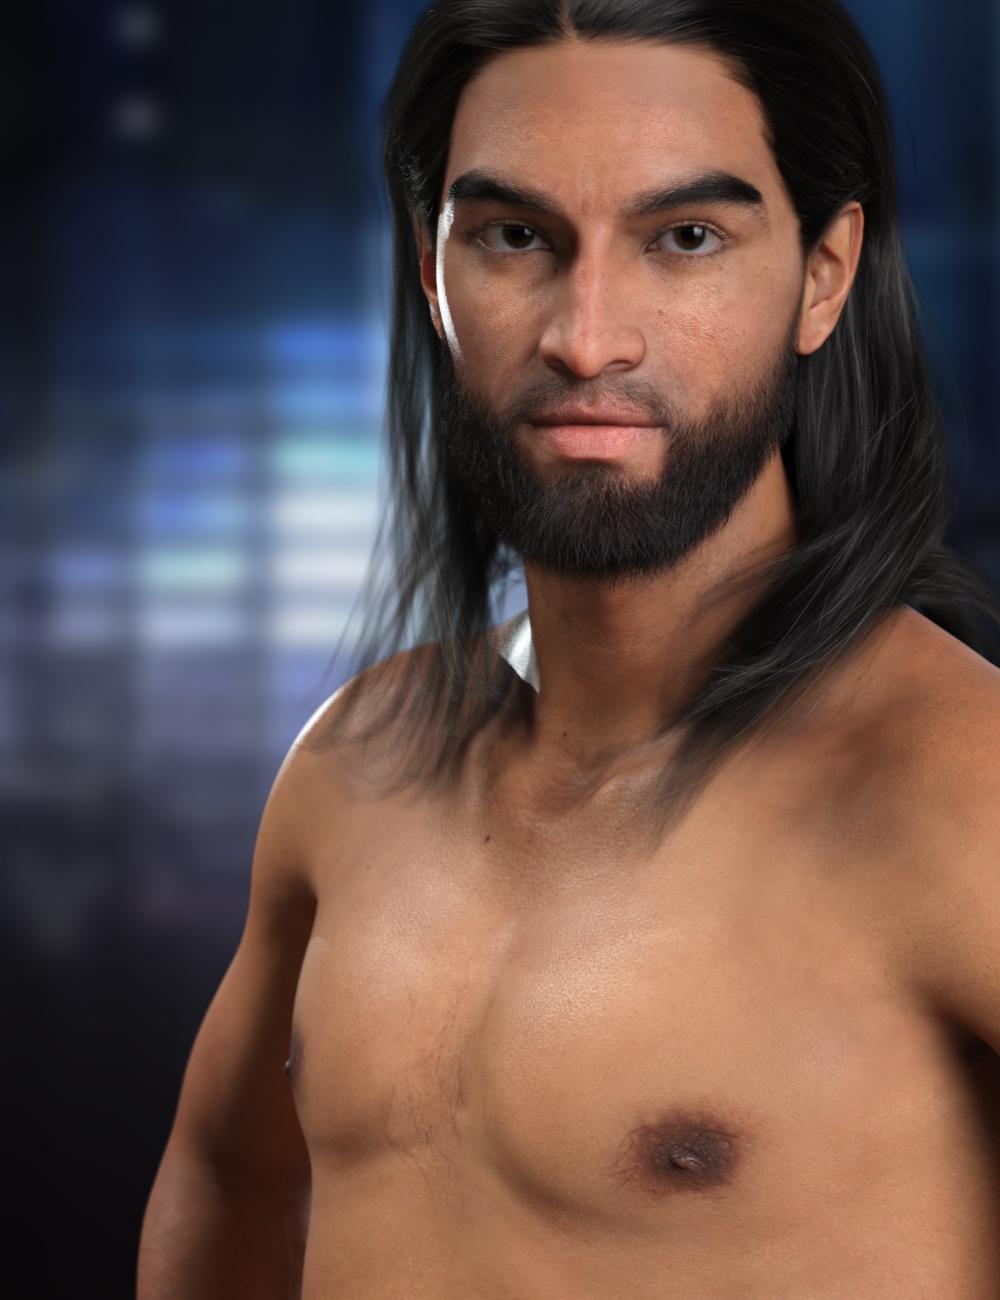 RY Dario for Genesis 8.1 Male by: Raiya, 3D Models by Daz 3D